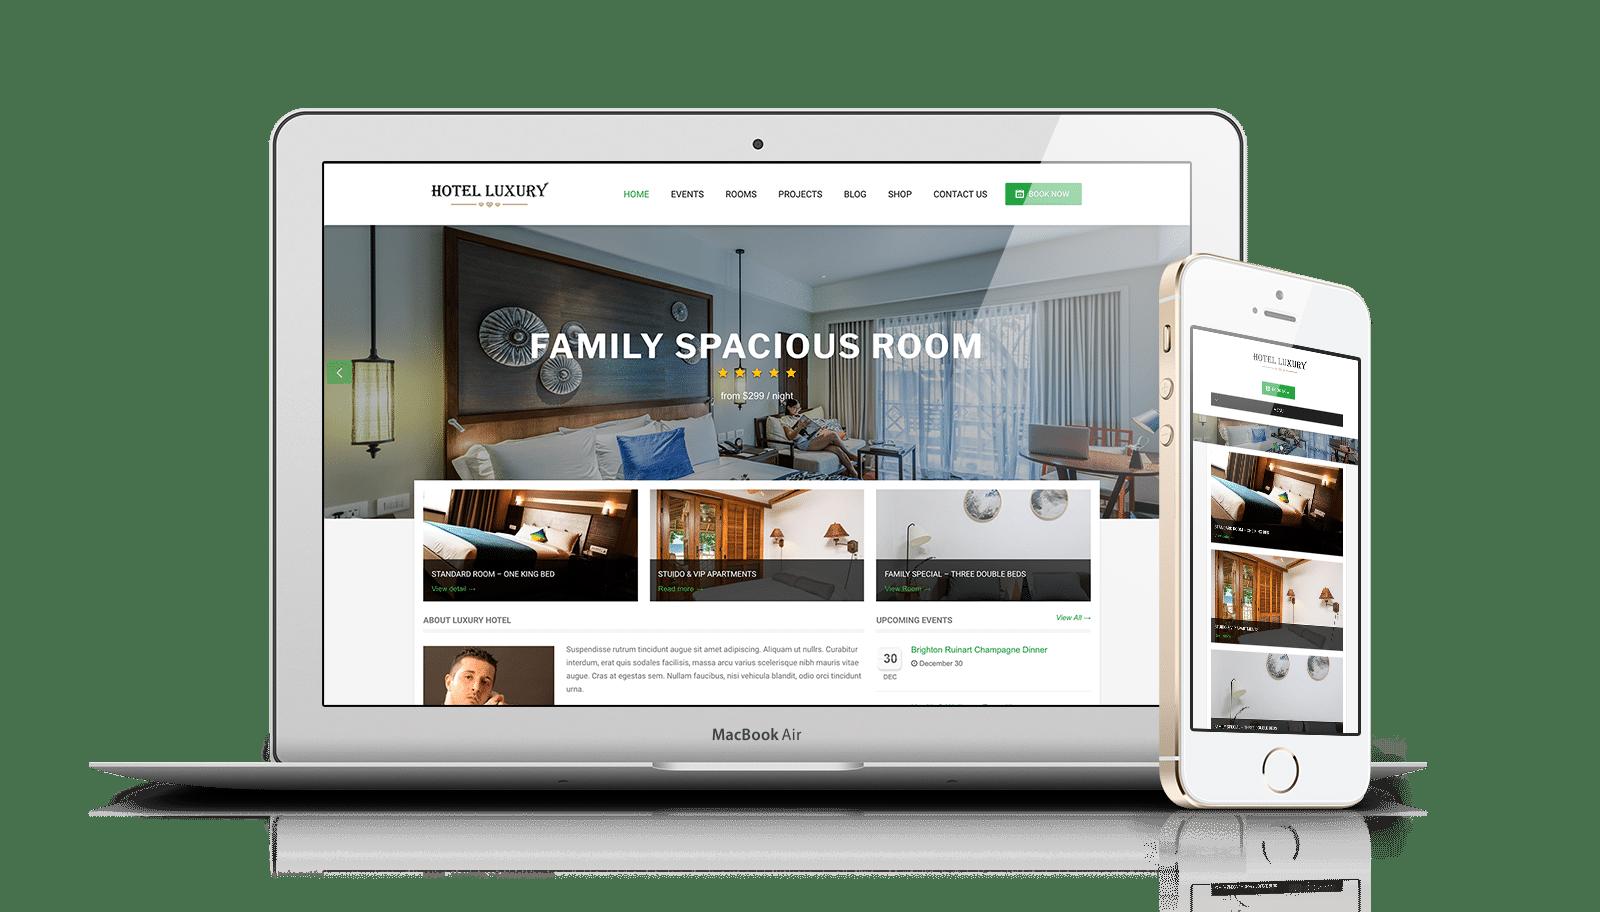 Hotel Luxury Pro